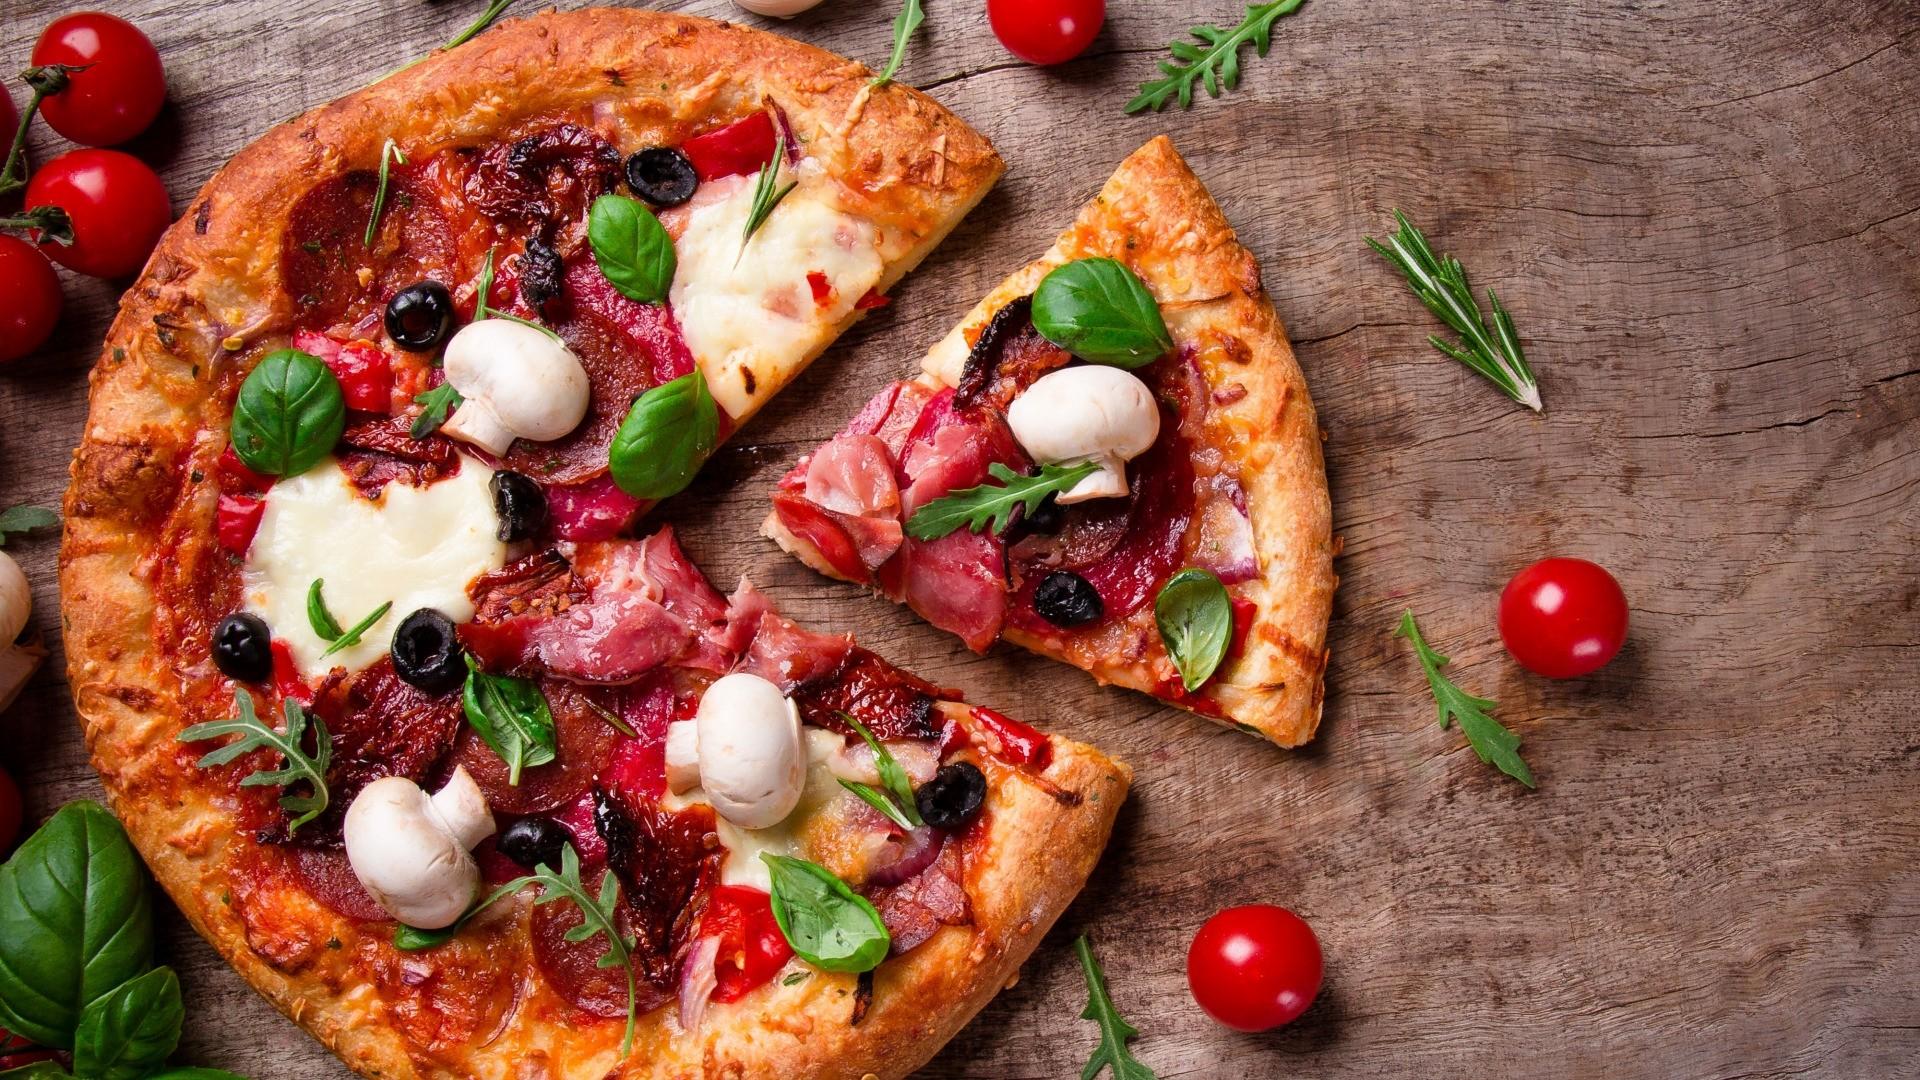 Pizza Wallpaper image hd